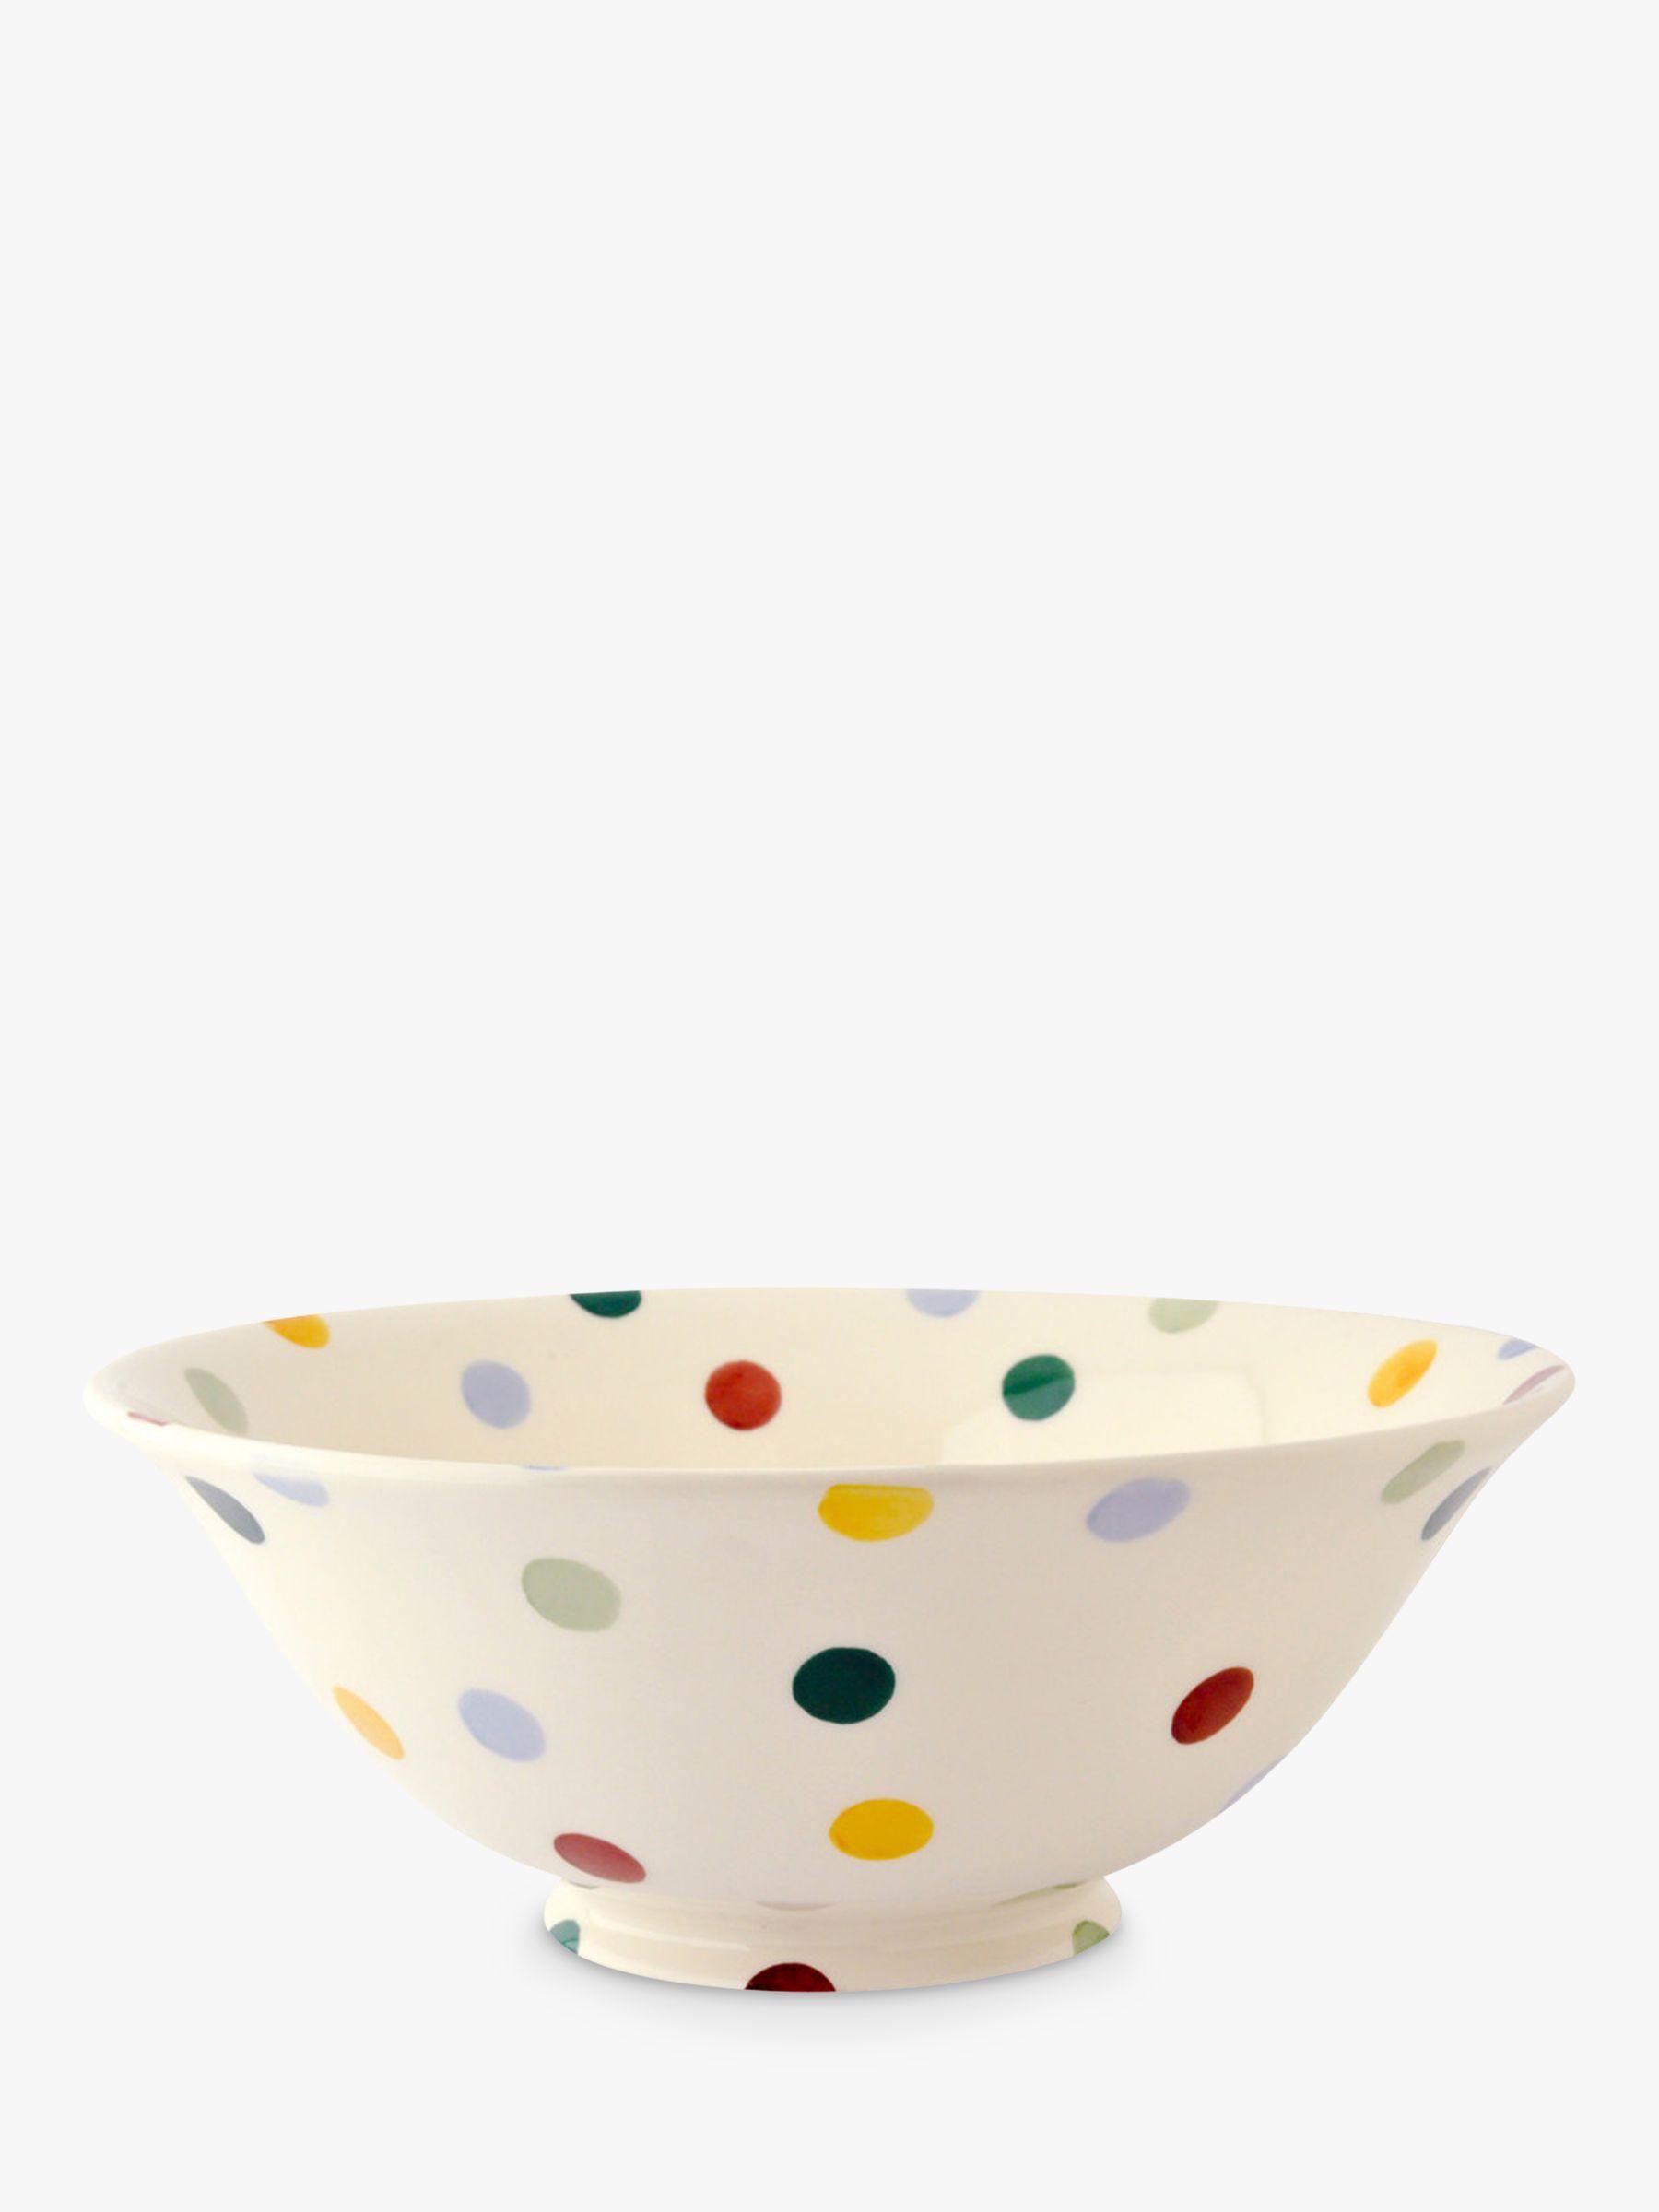 Emma Bridgewater Emma Bridgewater Polka Dot Serve Bowl, Medium